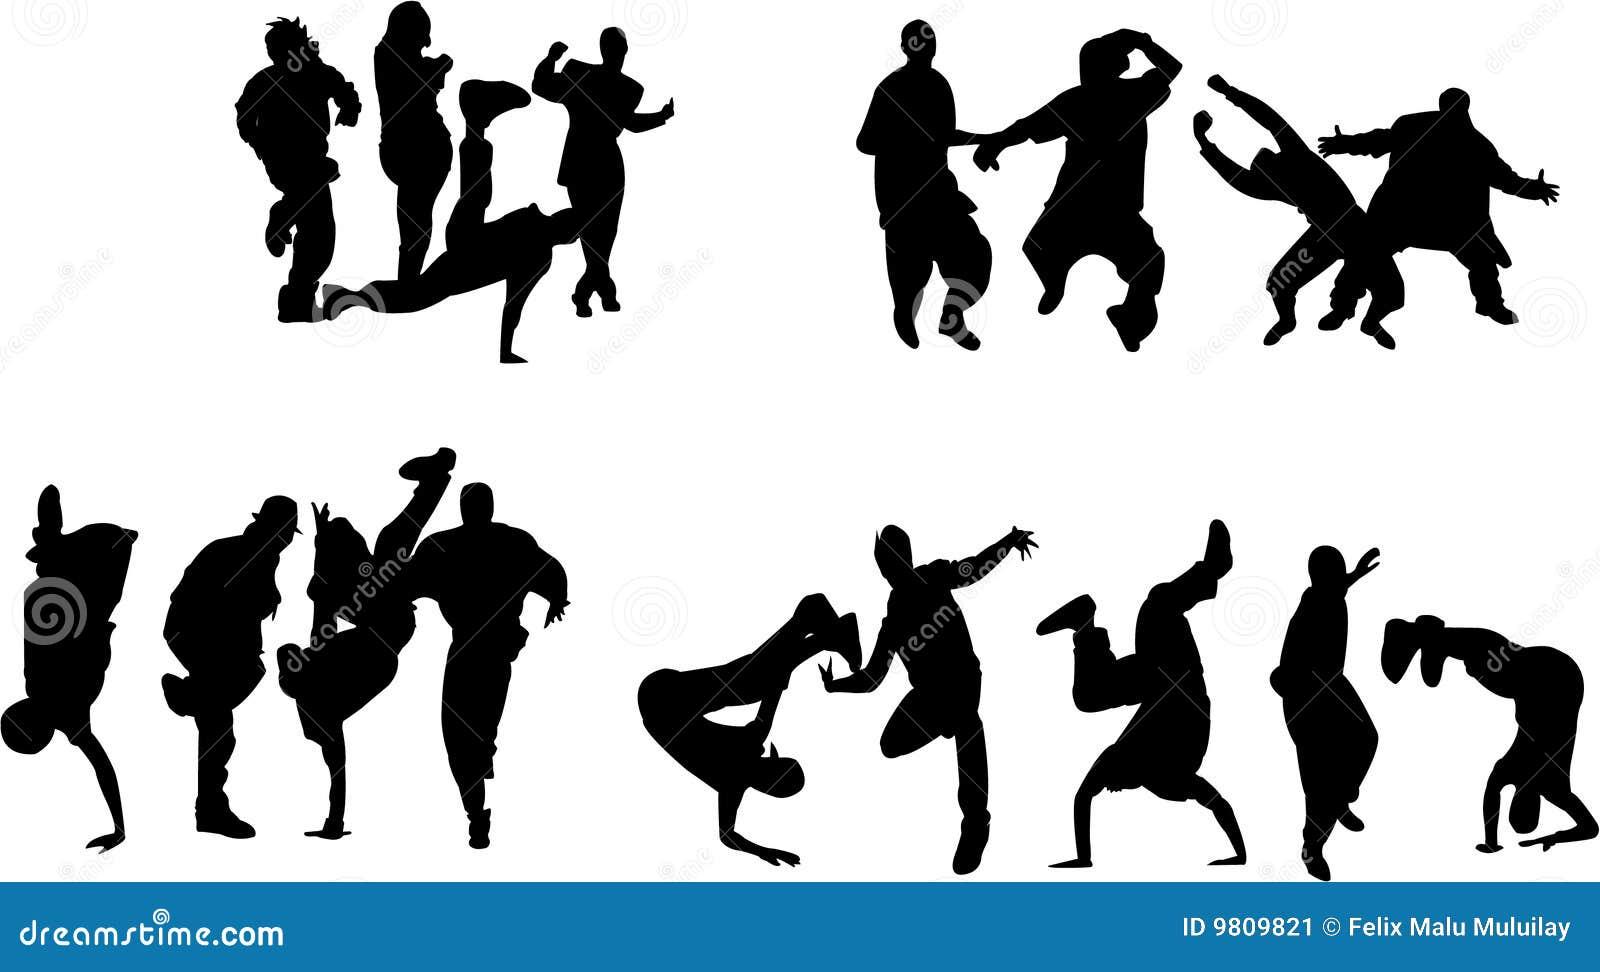 Freie Art Des Tanzens